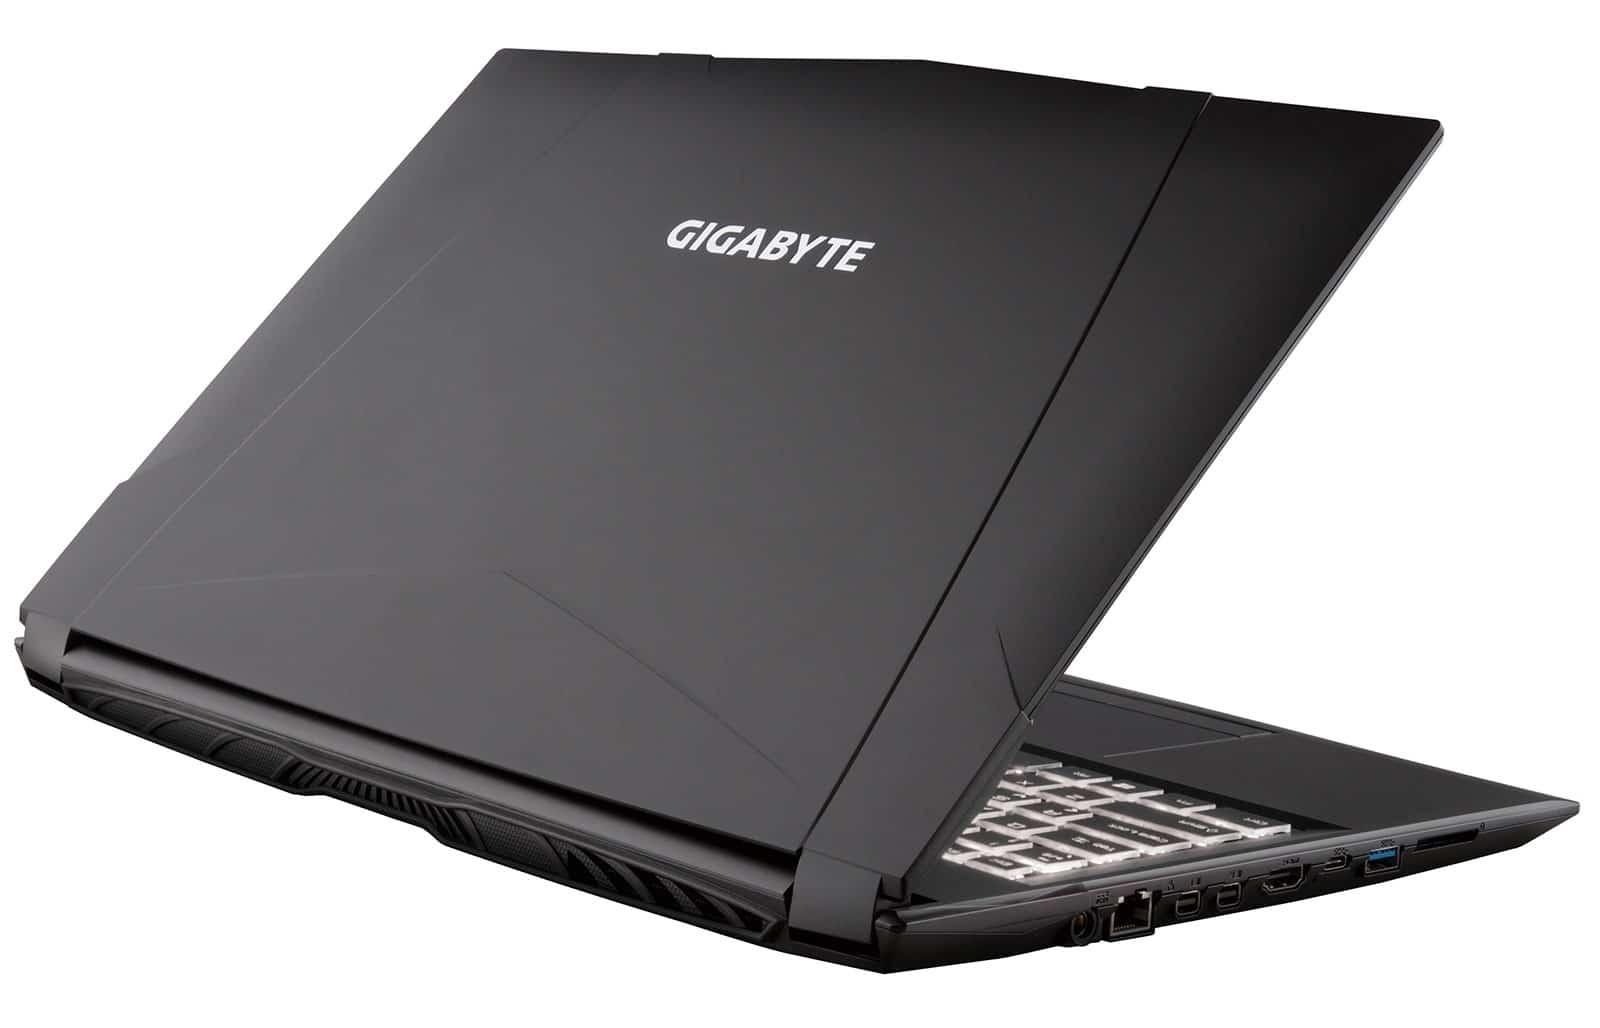 "Gigabyte Sabre 15 P45G V7 C32W10, PC portable 15"" IPS SSD i7 GTX 1050 1099€"